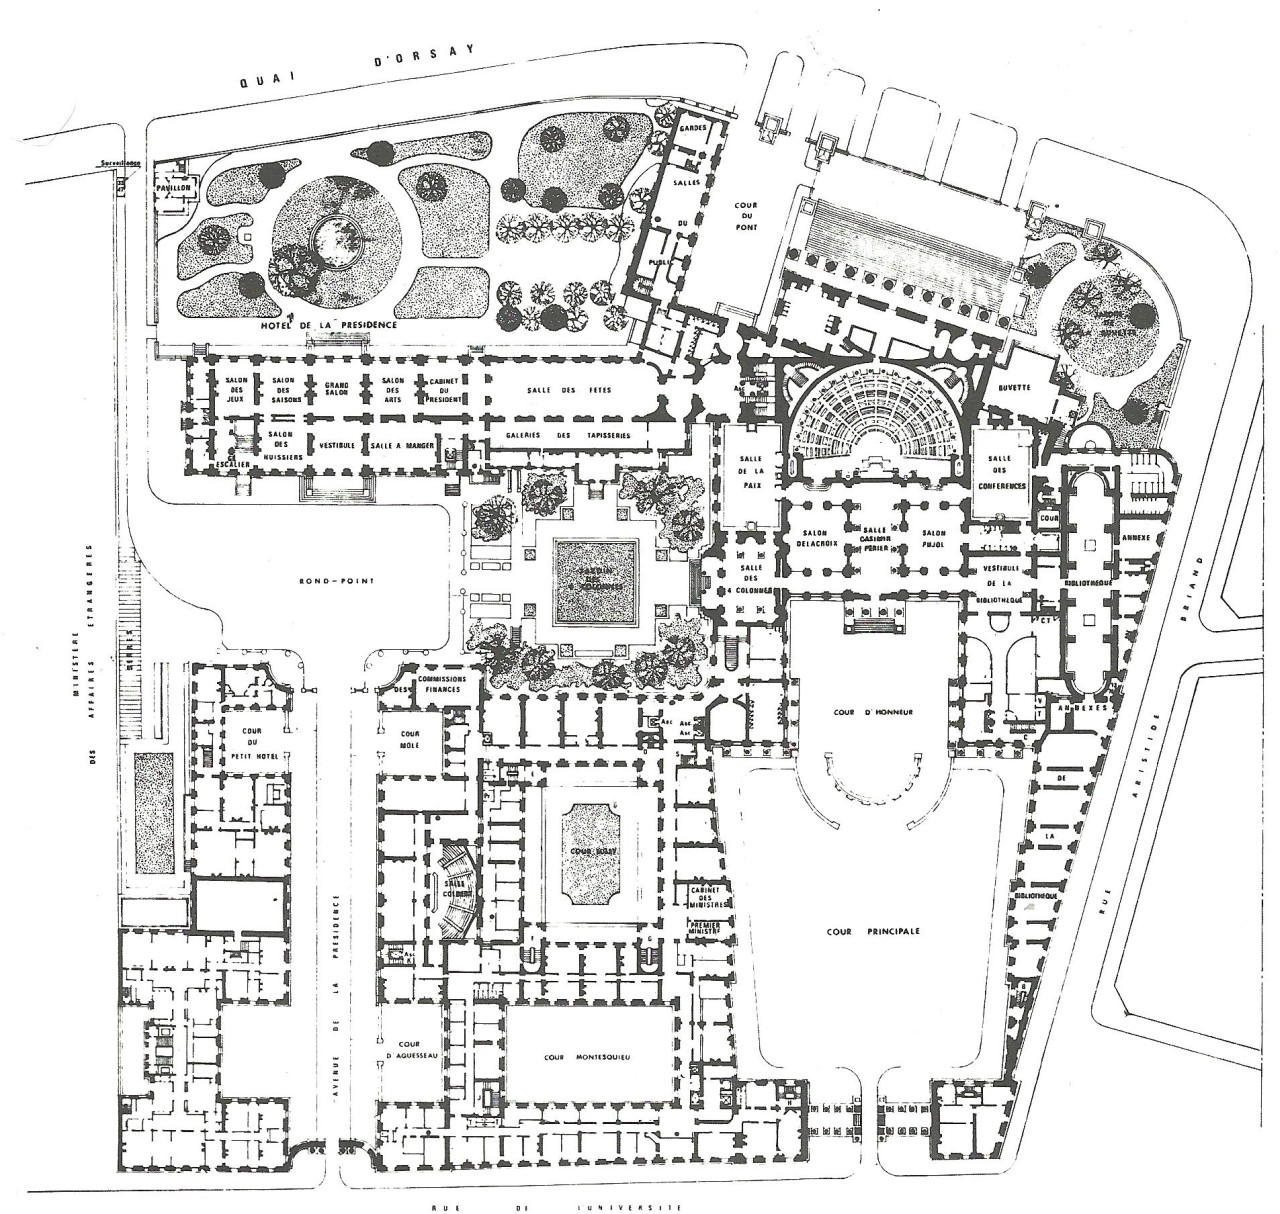 Palais Bourbon - Plan de l'étage principal.